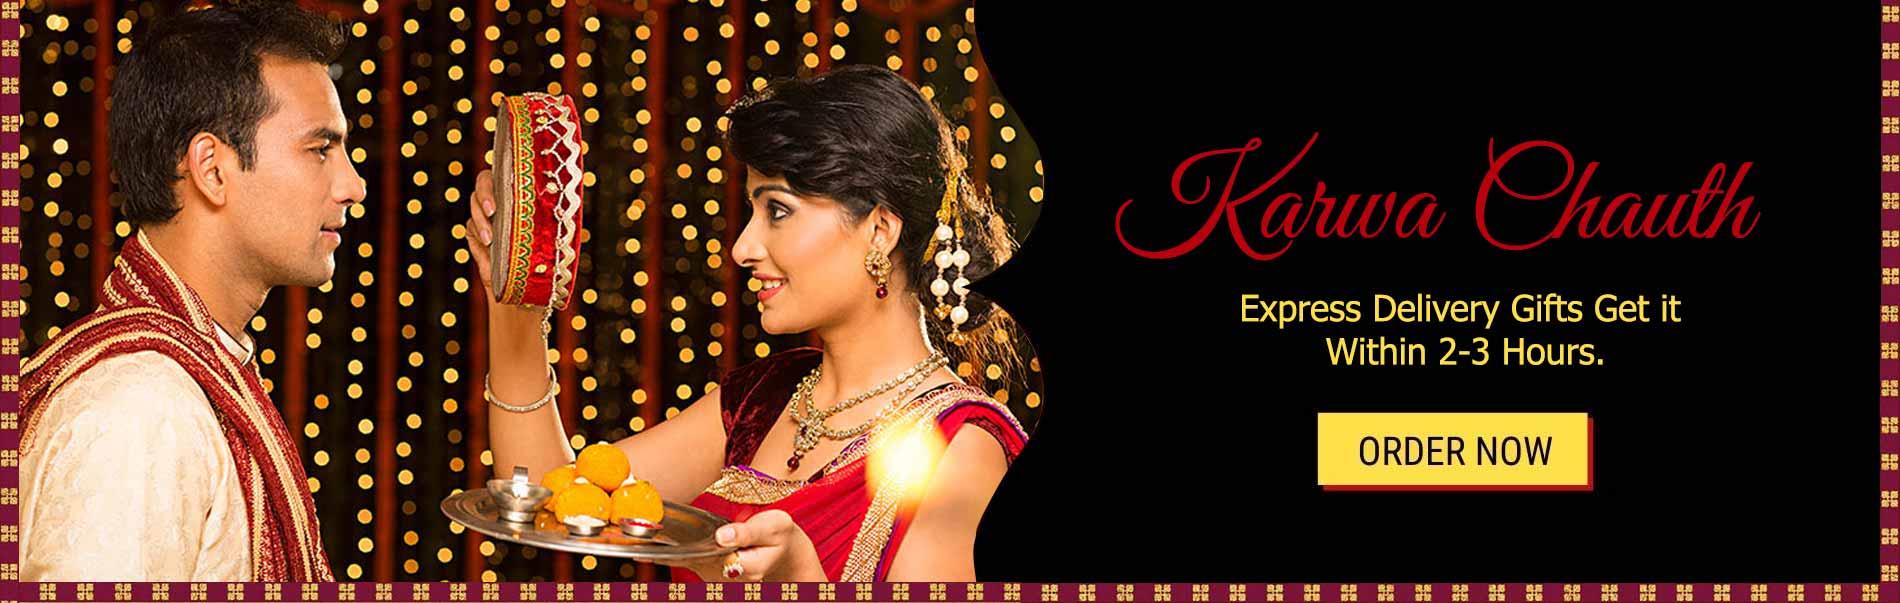 Karwa Chauth Express Gifts Online